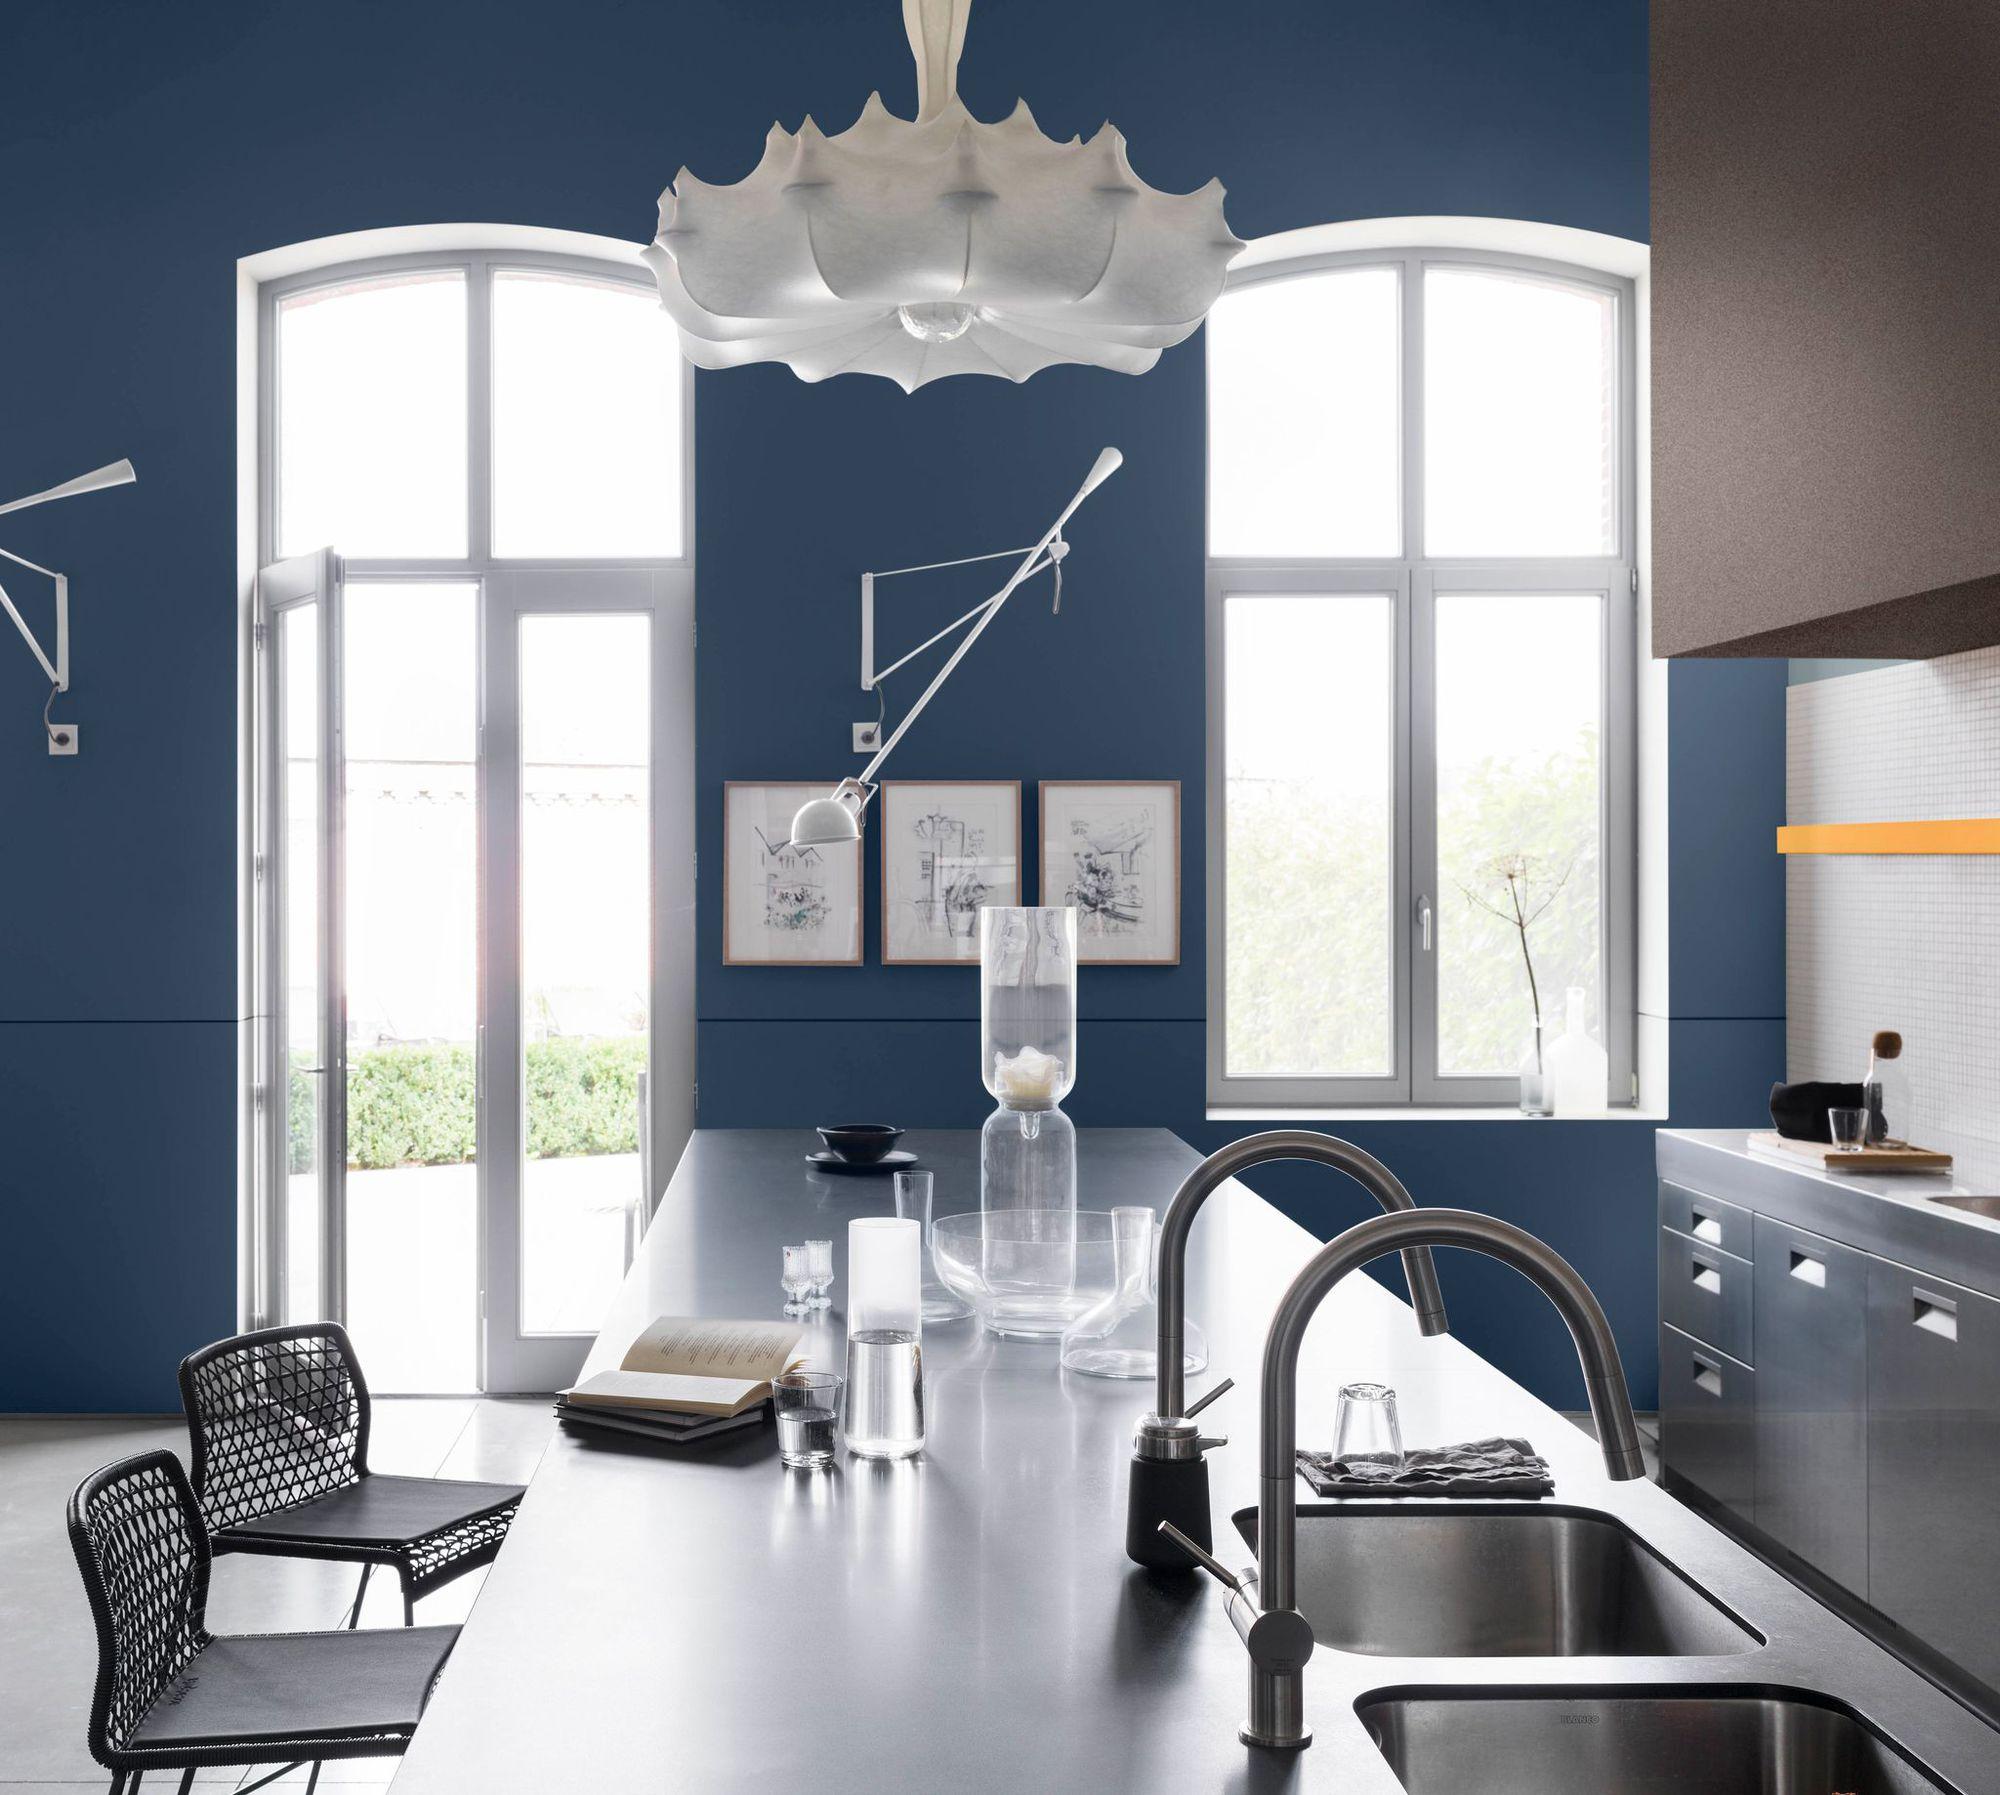 top 5 des tendances peinture pour 2018 habitatpresto. Black Bedroom Furniture Sets. Home Design Ideas